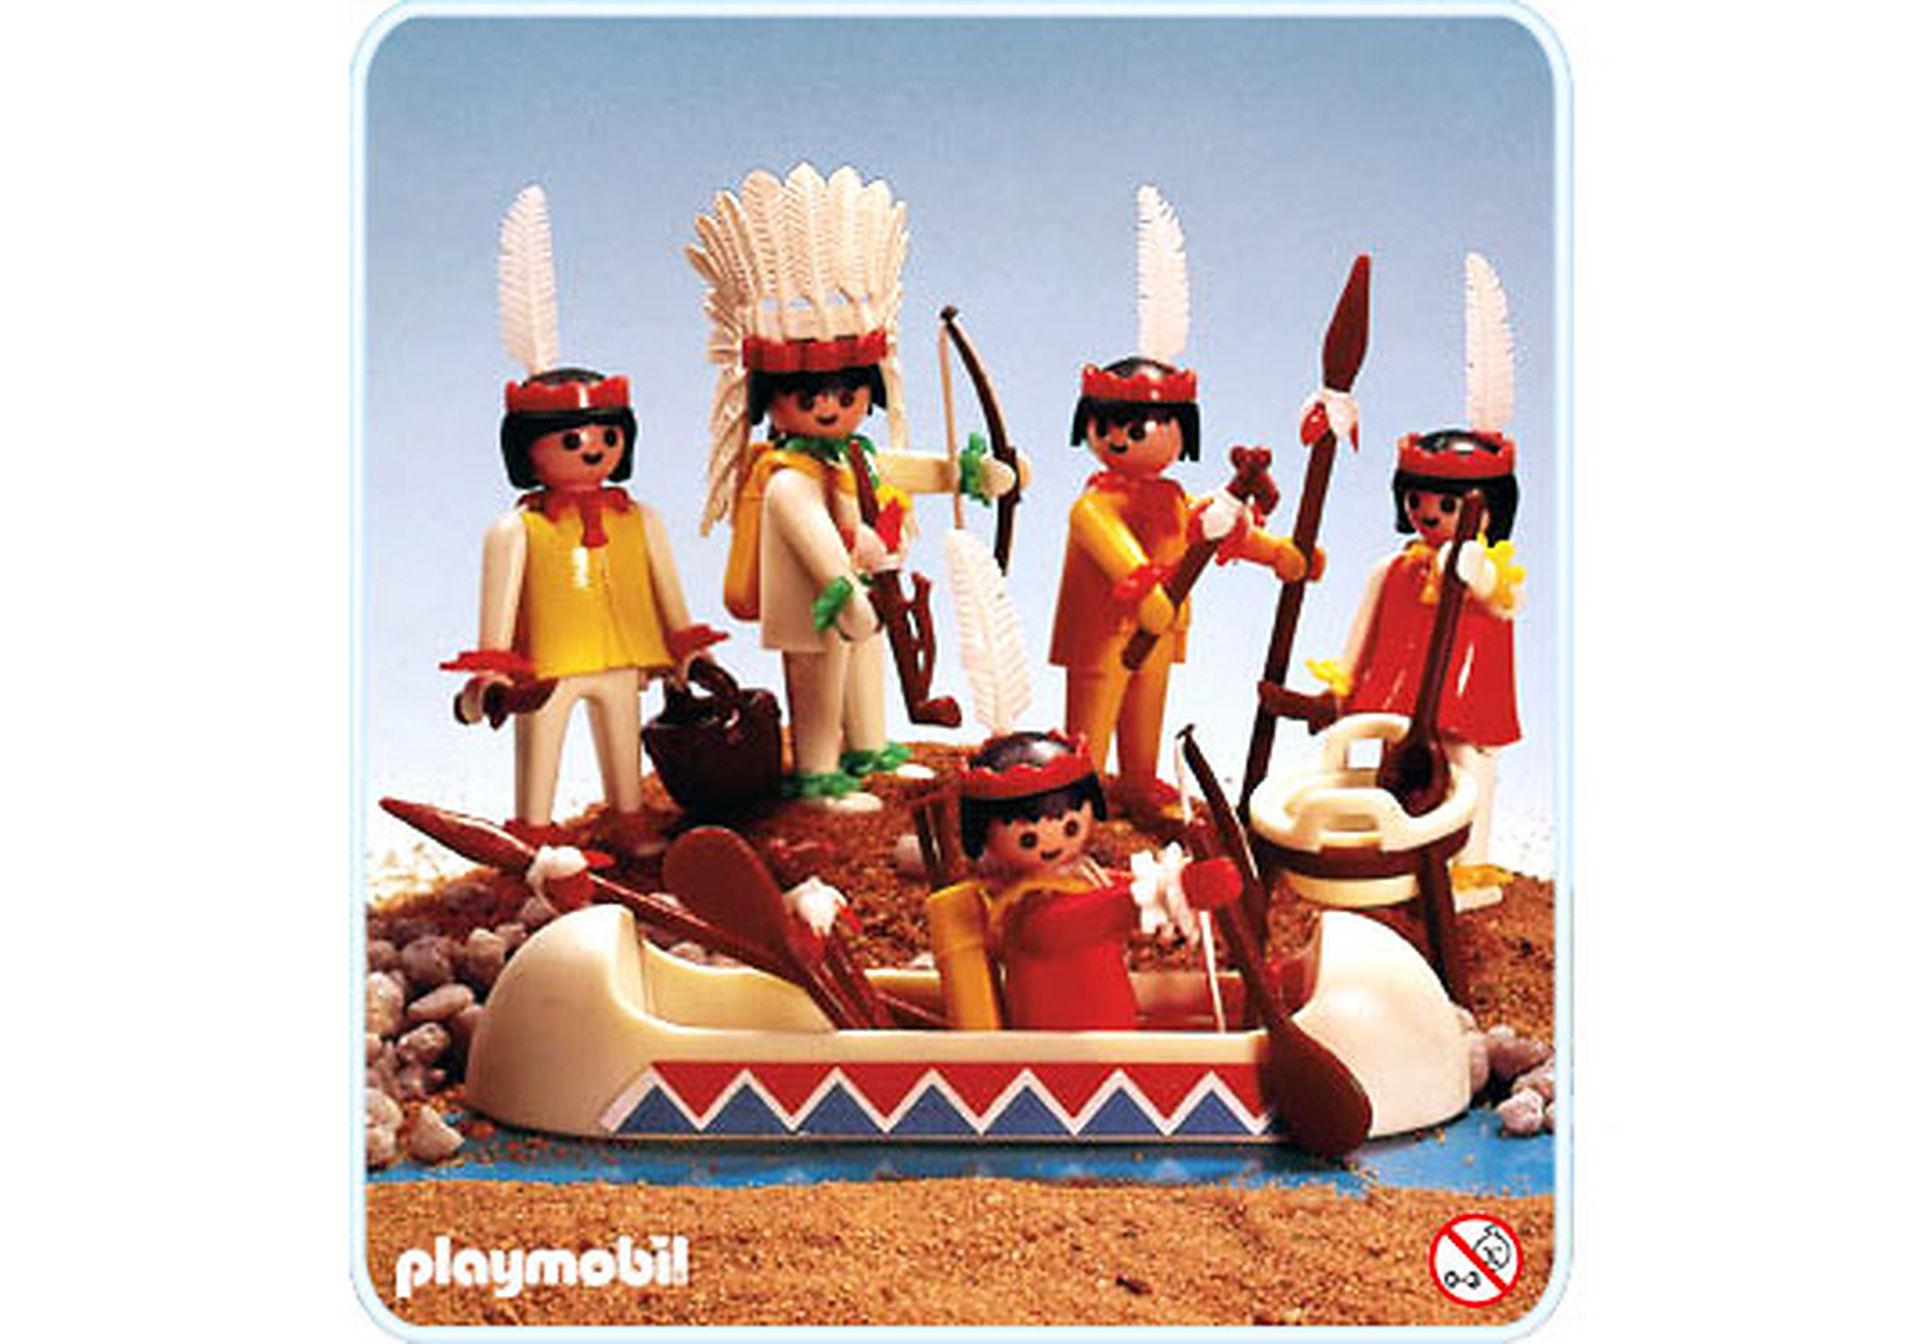 http://media.playmobil.com/i/playmobil/3251-B_product_detail/Indianer-Set